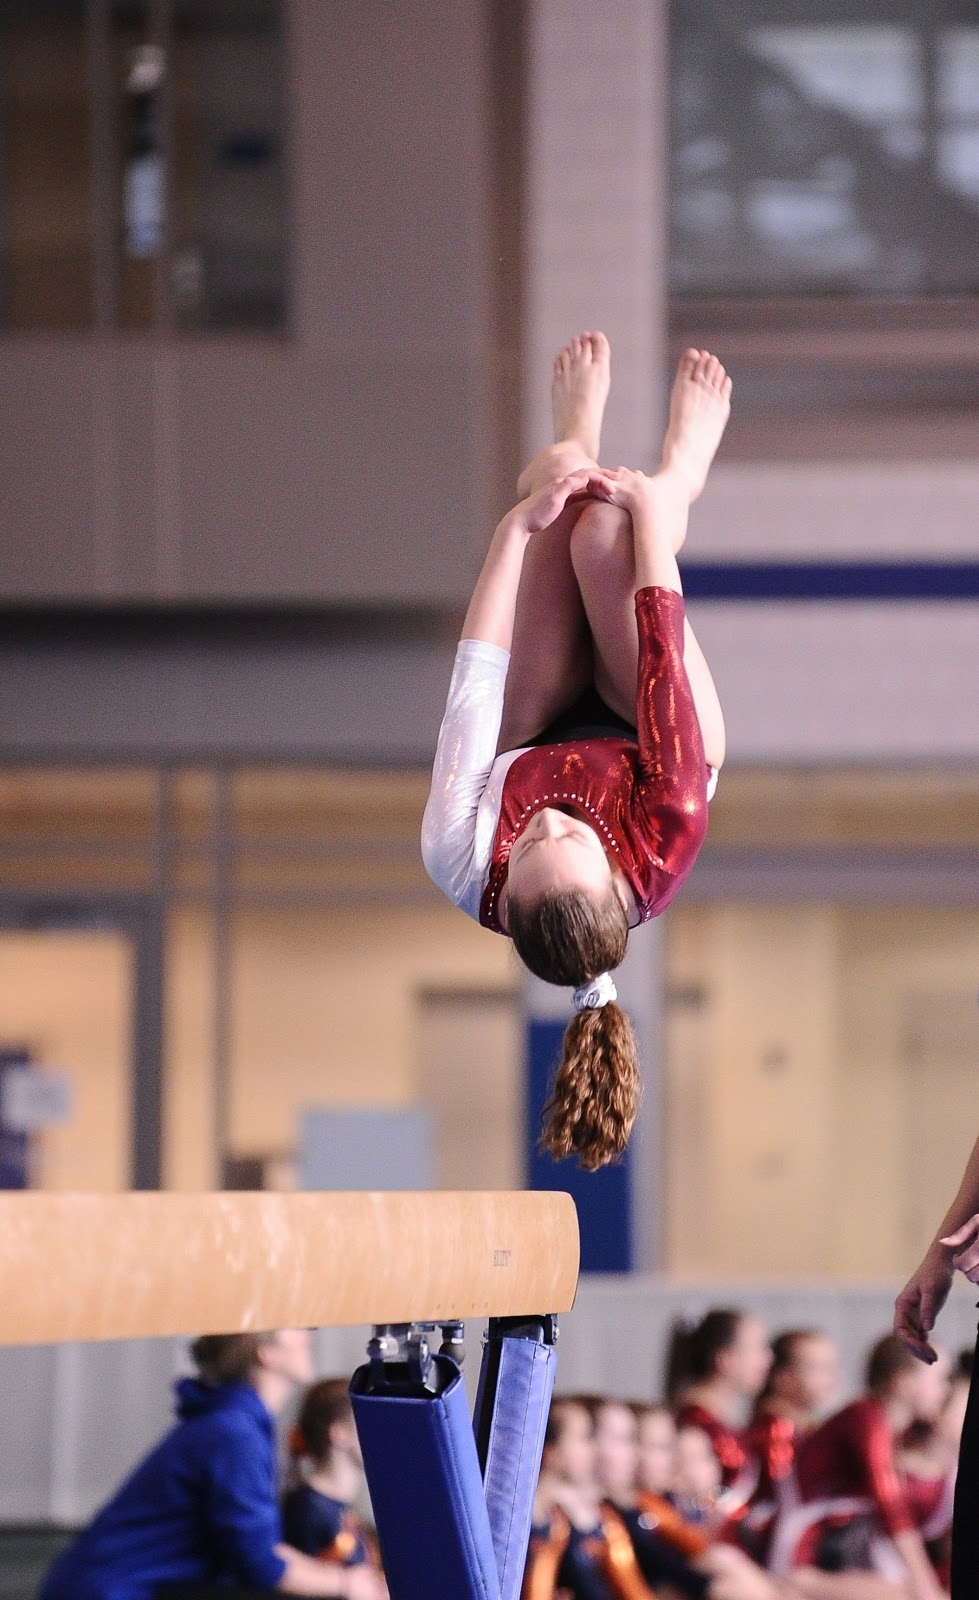 Suffield Gymnastics Academy - gym  | Photo 3 of 10 | Address: 110A Ffyler Pl, Suffield, CT 06078, USA | Phone: (860) 936-1833